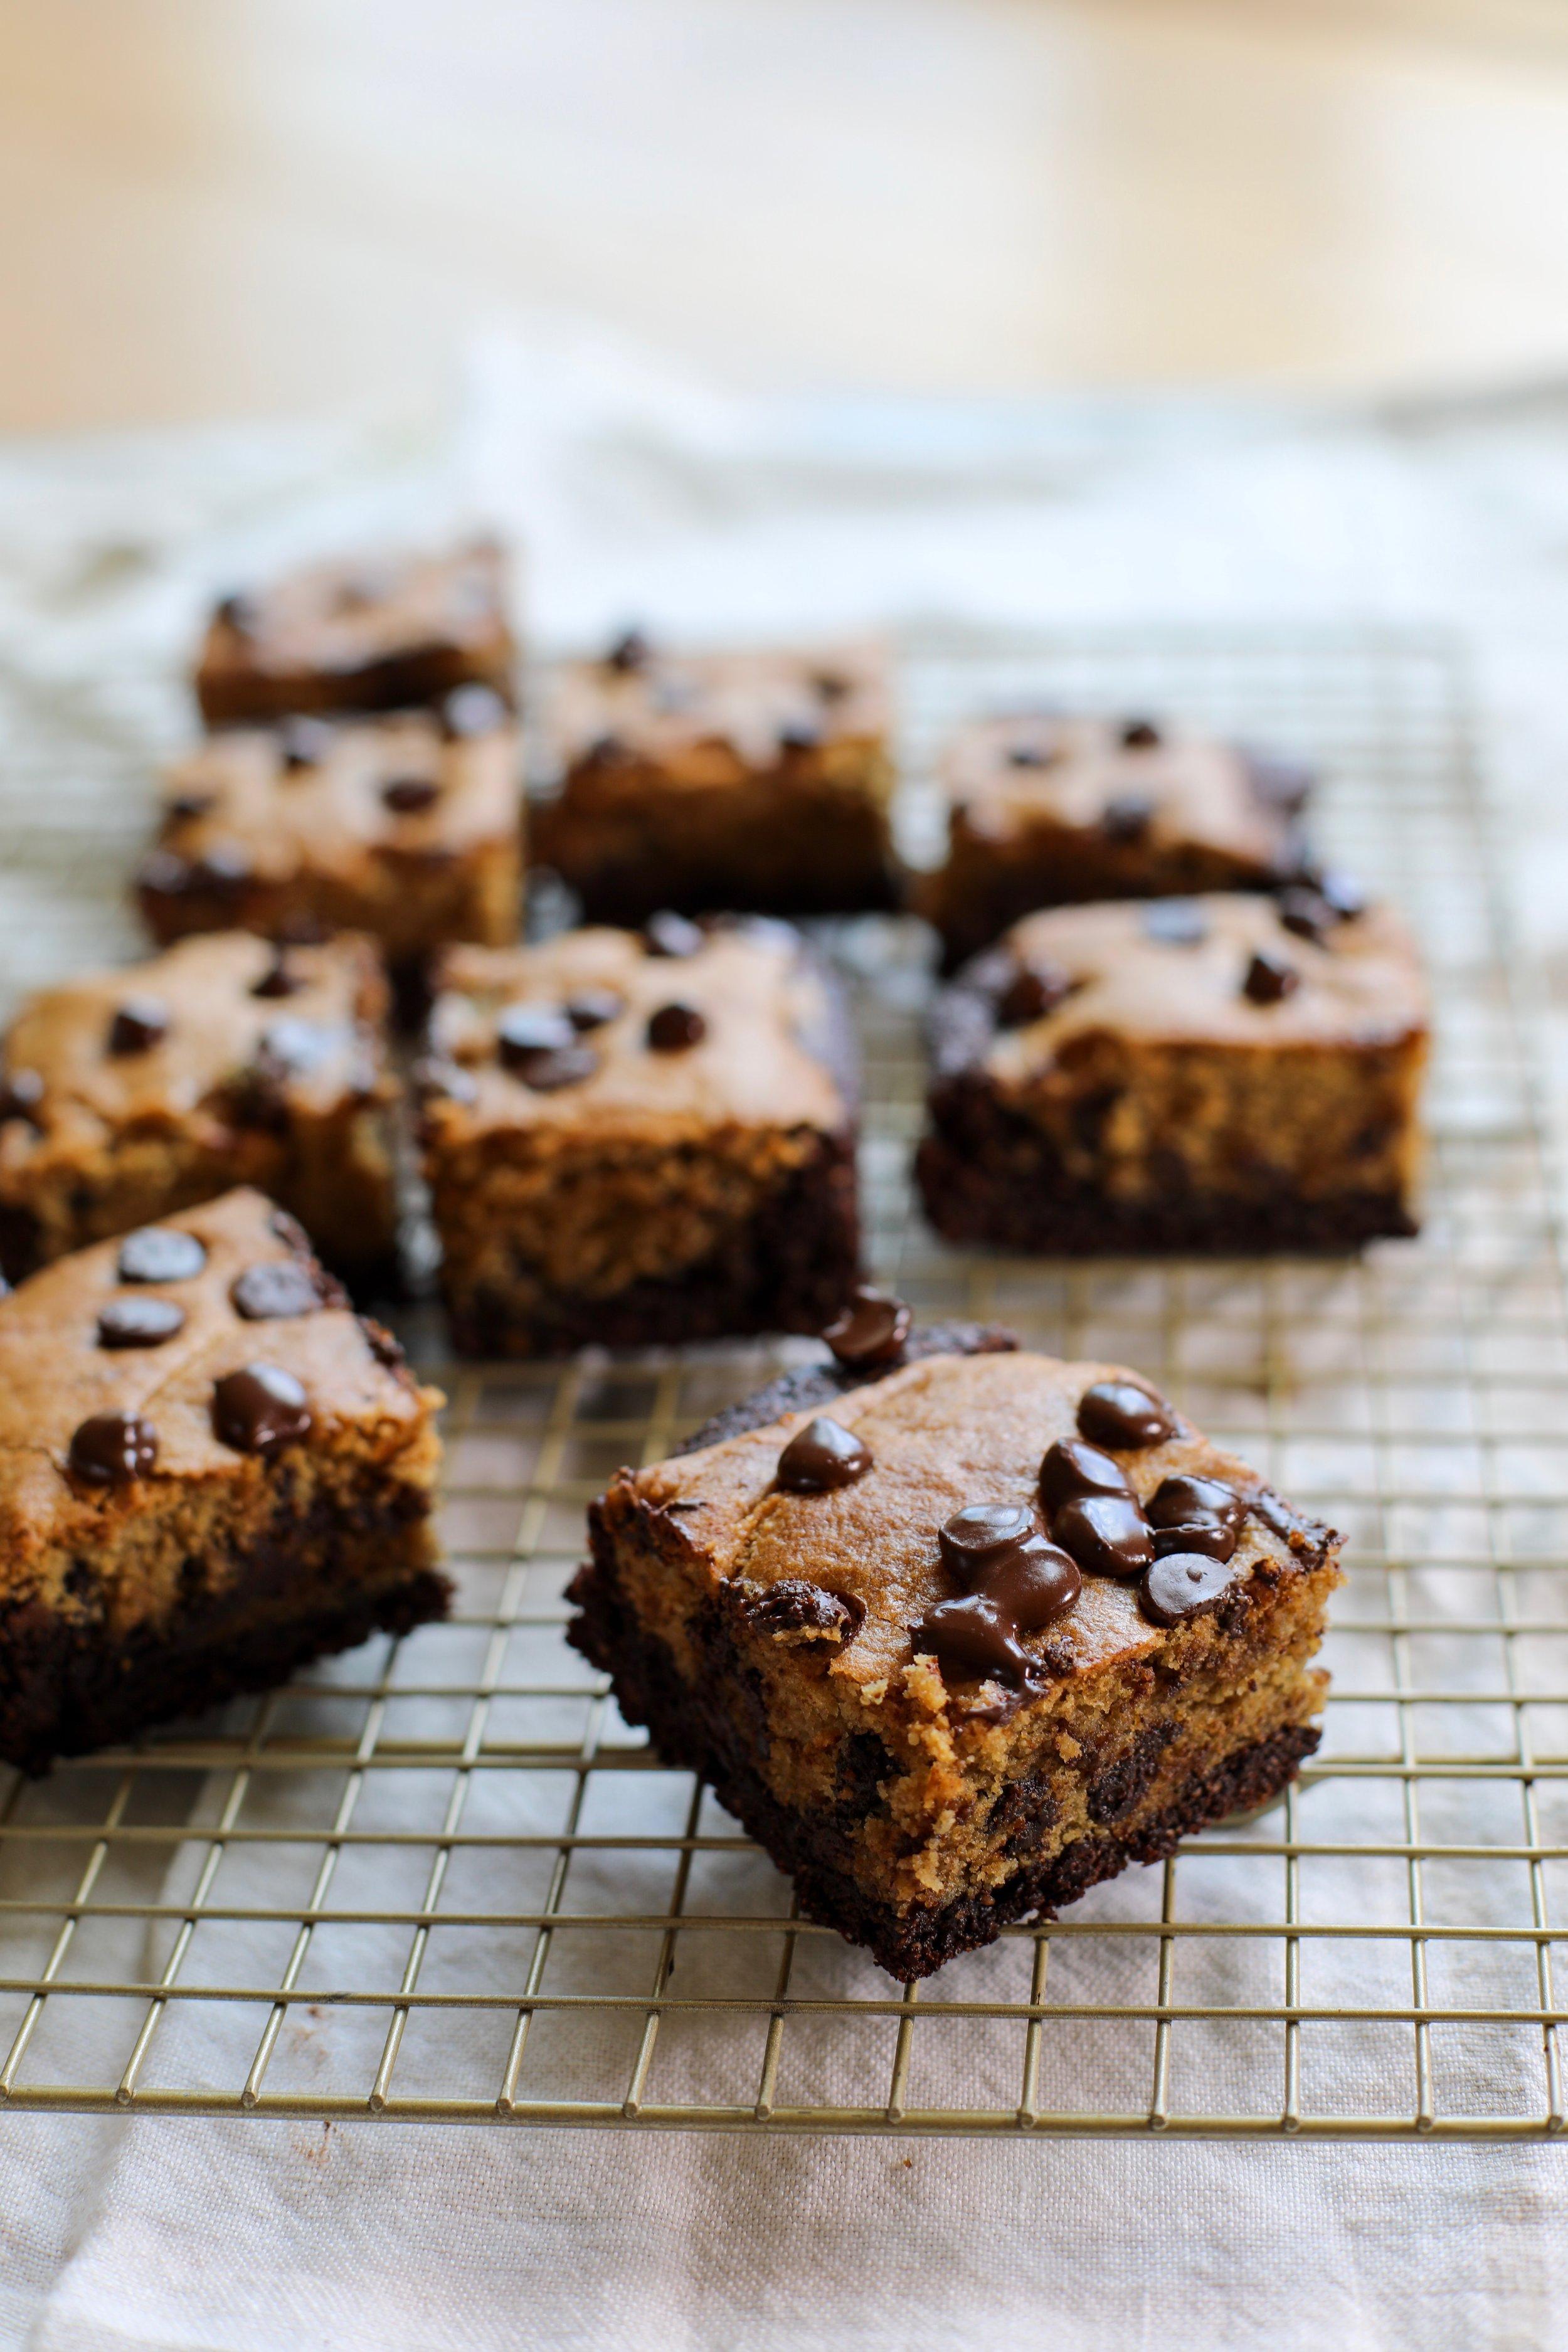 PALEO TAHINI BROOKIES - INGREDIENTS1 box Simple Mills Brownie Mix2 eggs1/2 cup oil or butter3 tablespoons water+ Kalejunkie's Life Changing Tahini Chocolate Chip Cookies